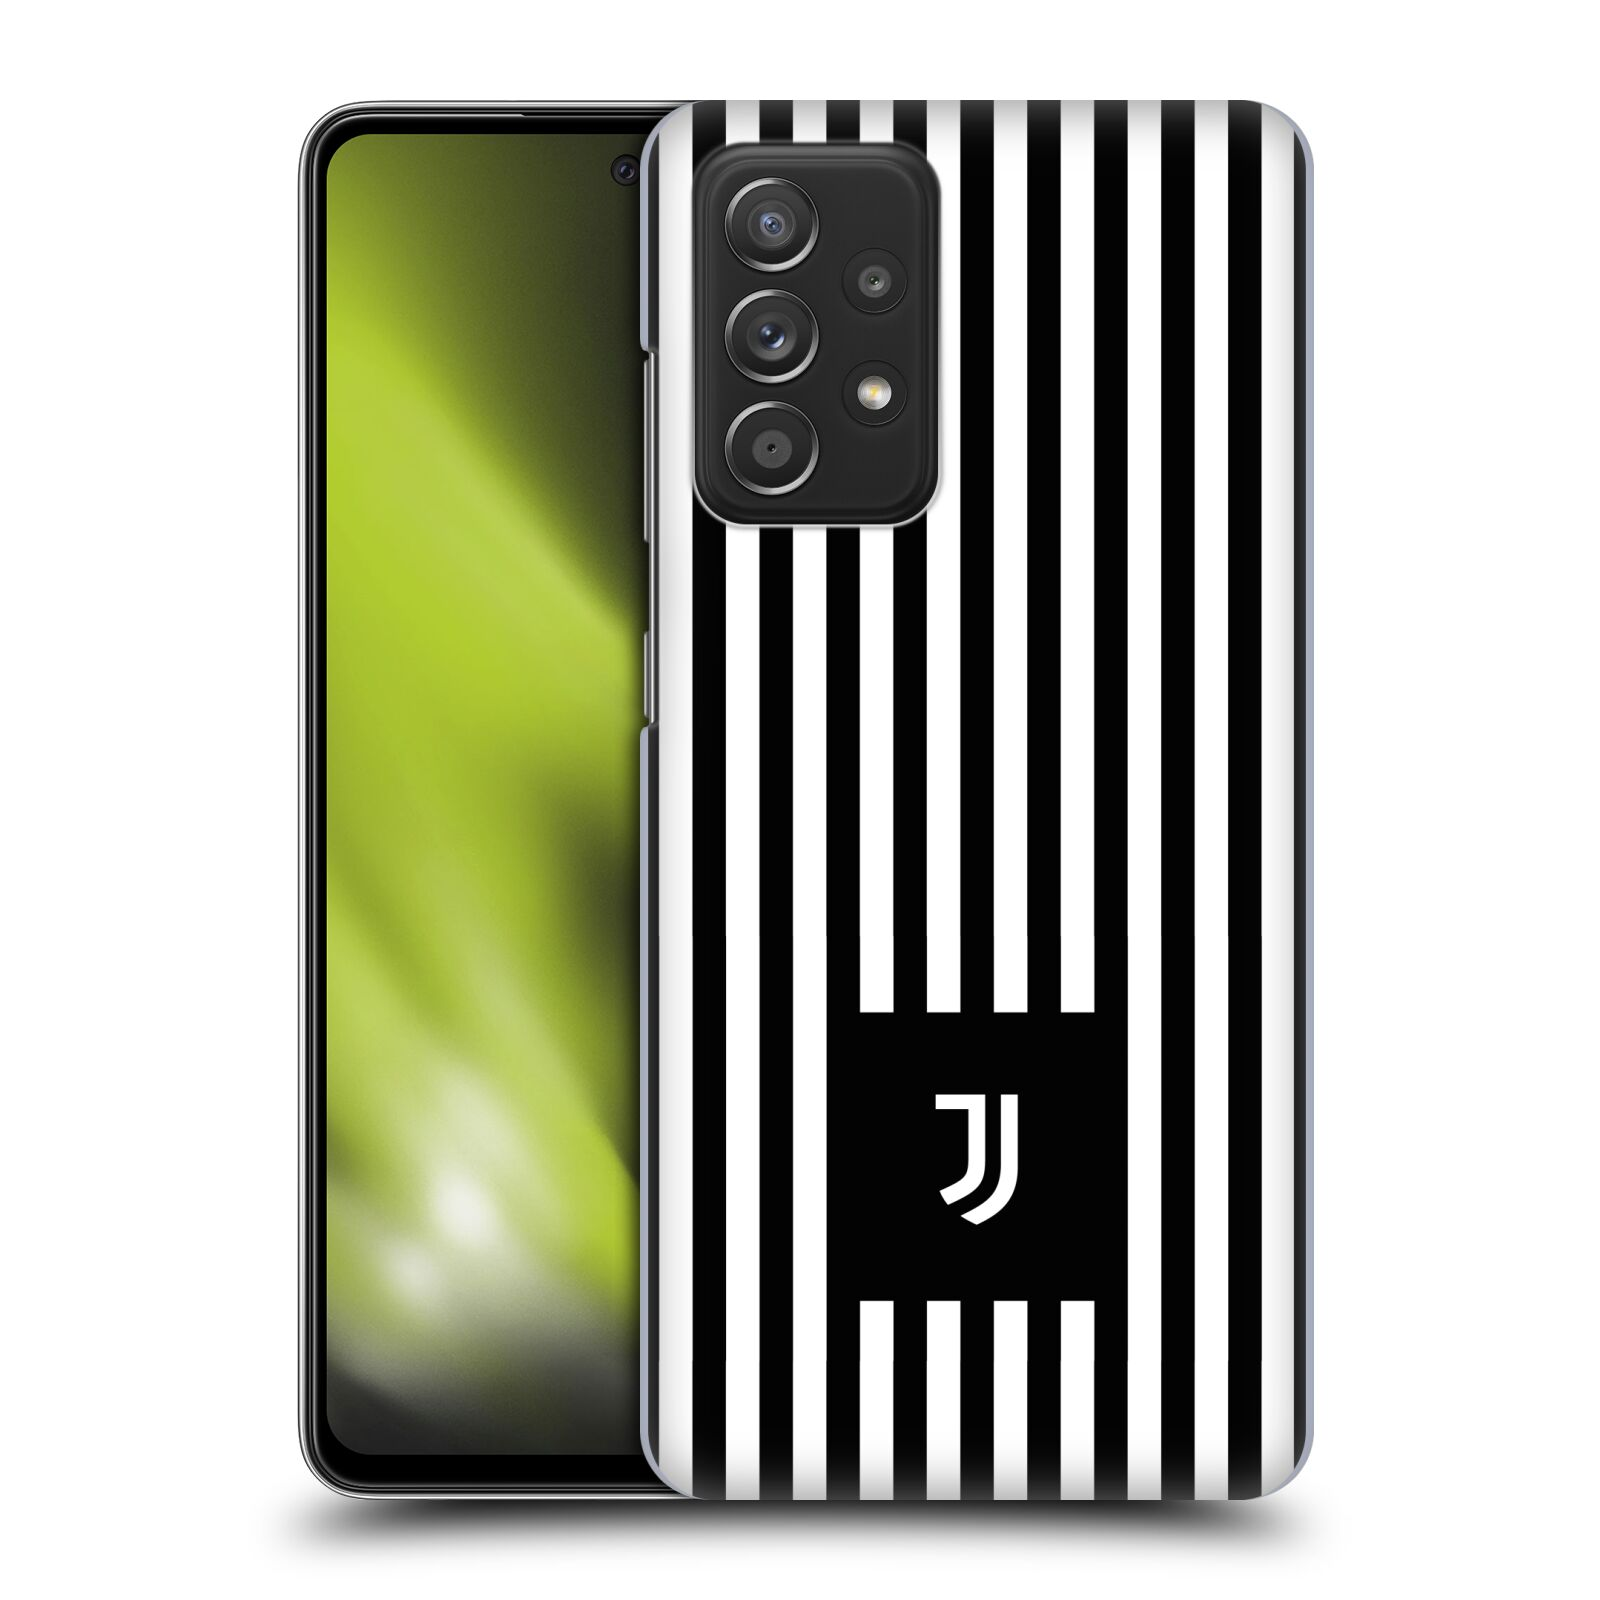 Plastové pouzdro na mobil Samsung Galaxy A52 / A52 5G / A52s 5G - Head Case - Juventus FC - Nové logo - Pruhy